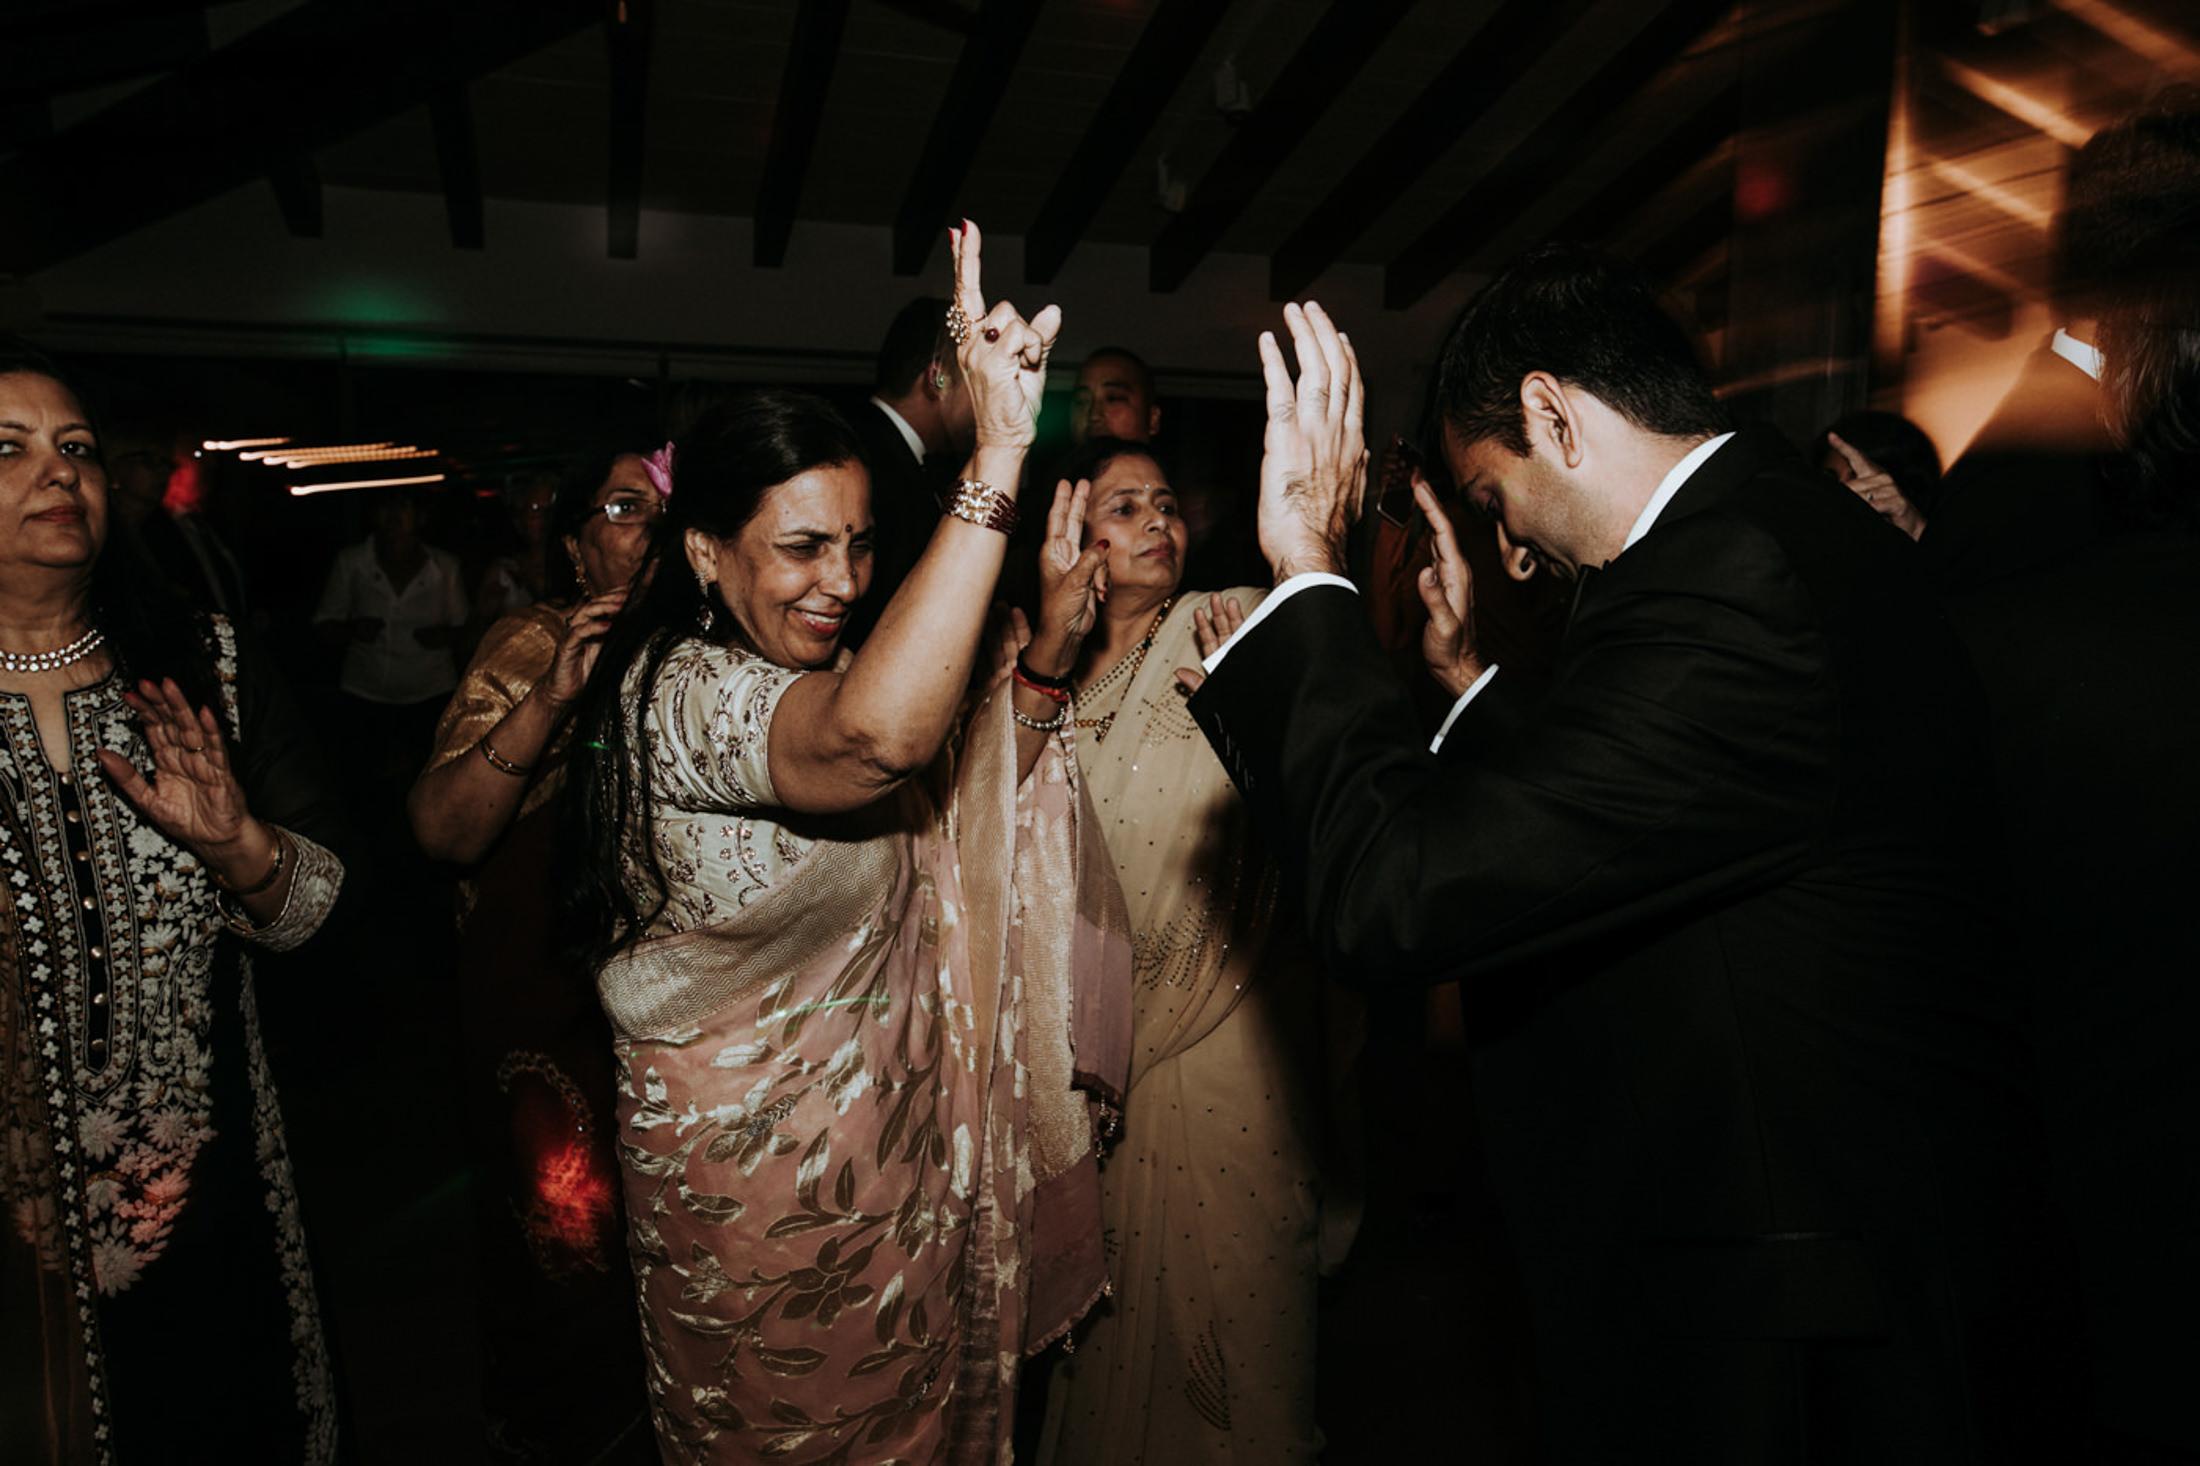 Wedding_Photographer_Mallorca_Daniela-Marquardt_Photography_New_York_Iceland_Tuscany_Santorini_Portugal_Austria_Bavaria_Elopement_Hochzeitsfotograf_AntjeRajat2_123